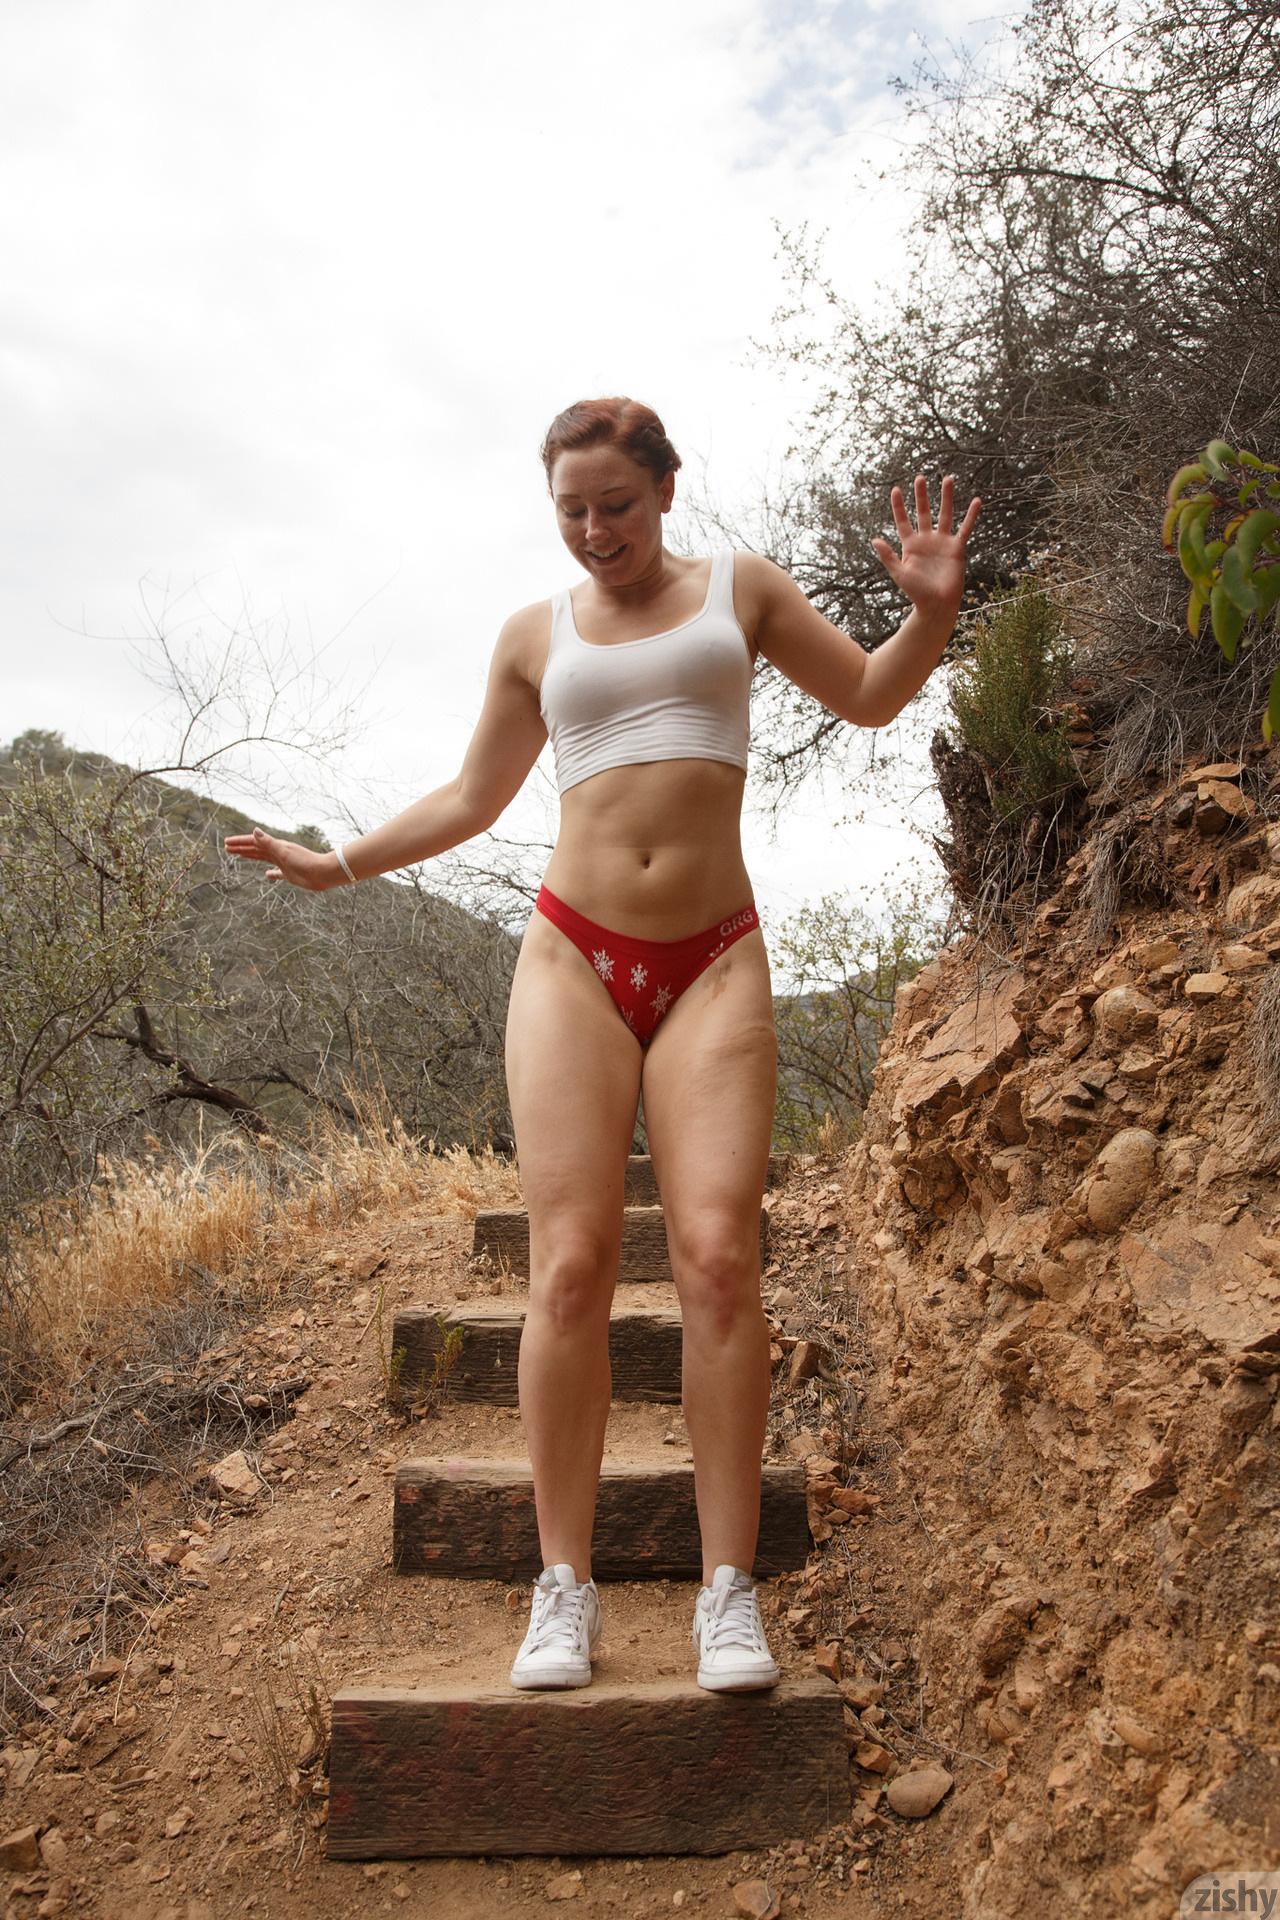 Spencer Bisson Back Trail Zishy (70)